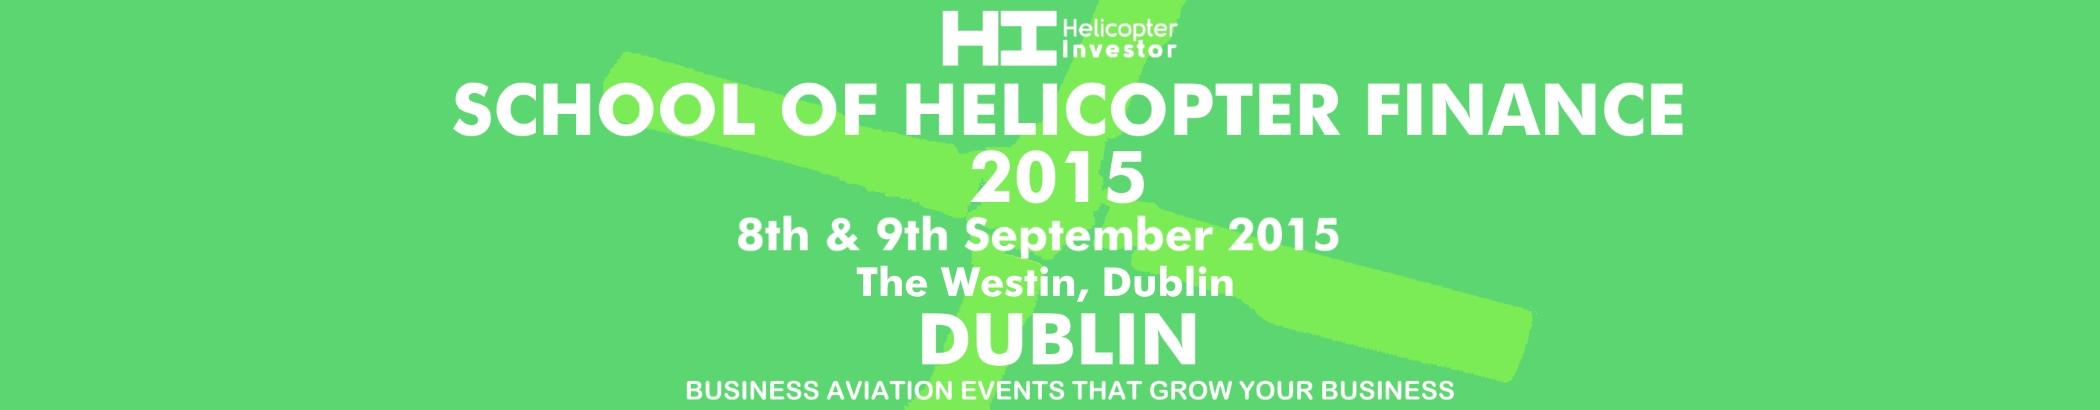 DUBLIN HELICOPTER SCHOOL